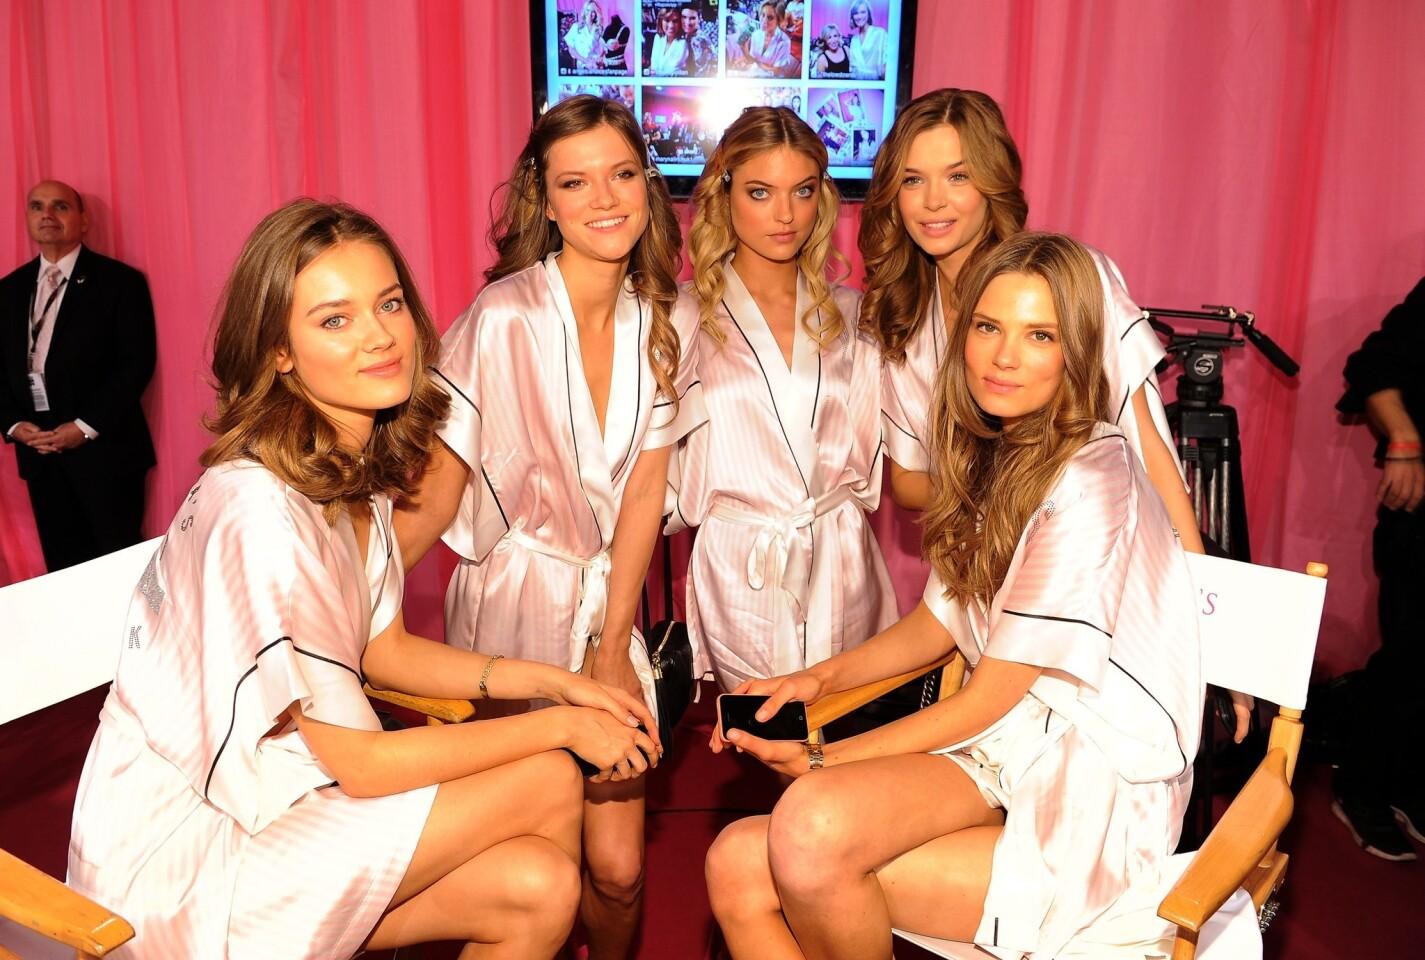 Backstage at the 2013 Victoria's Secret Fashion Show